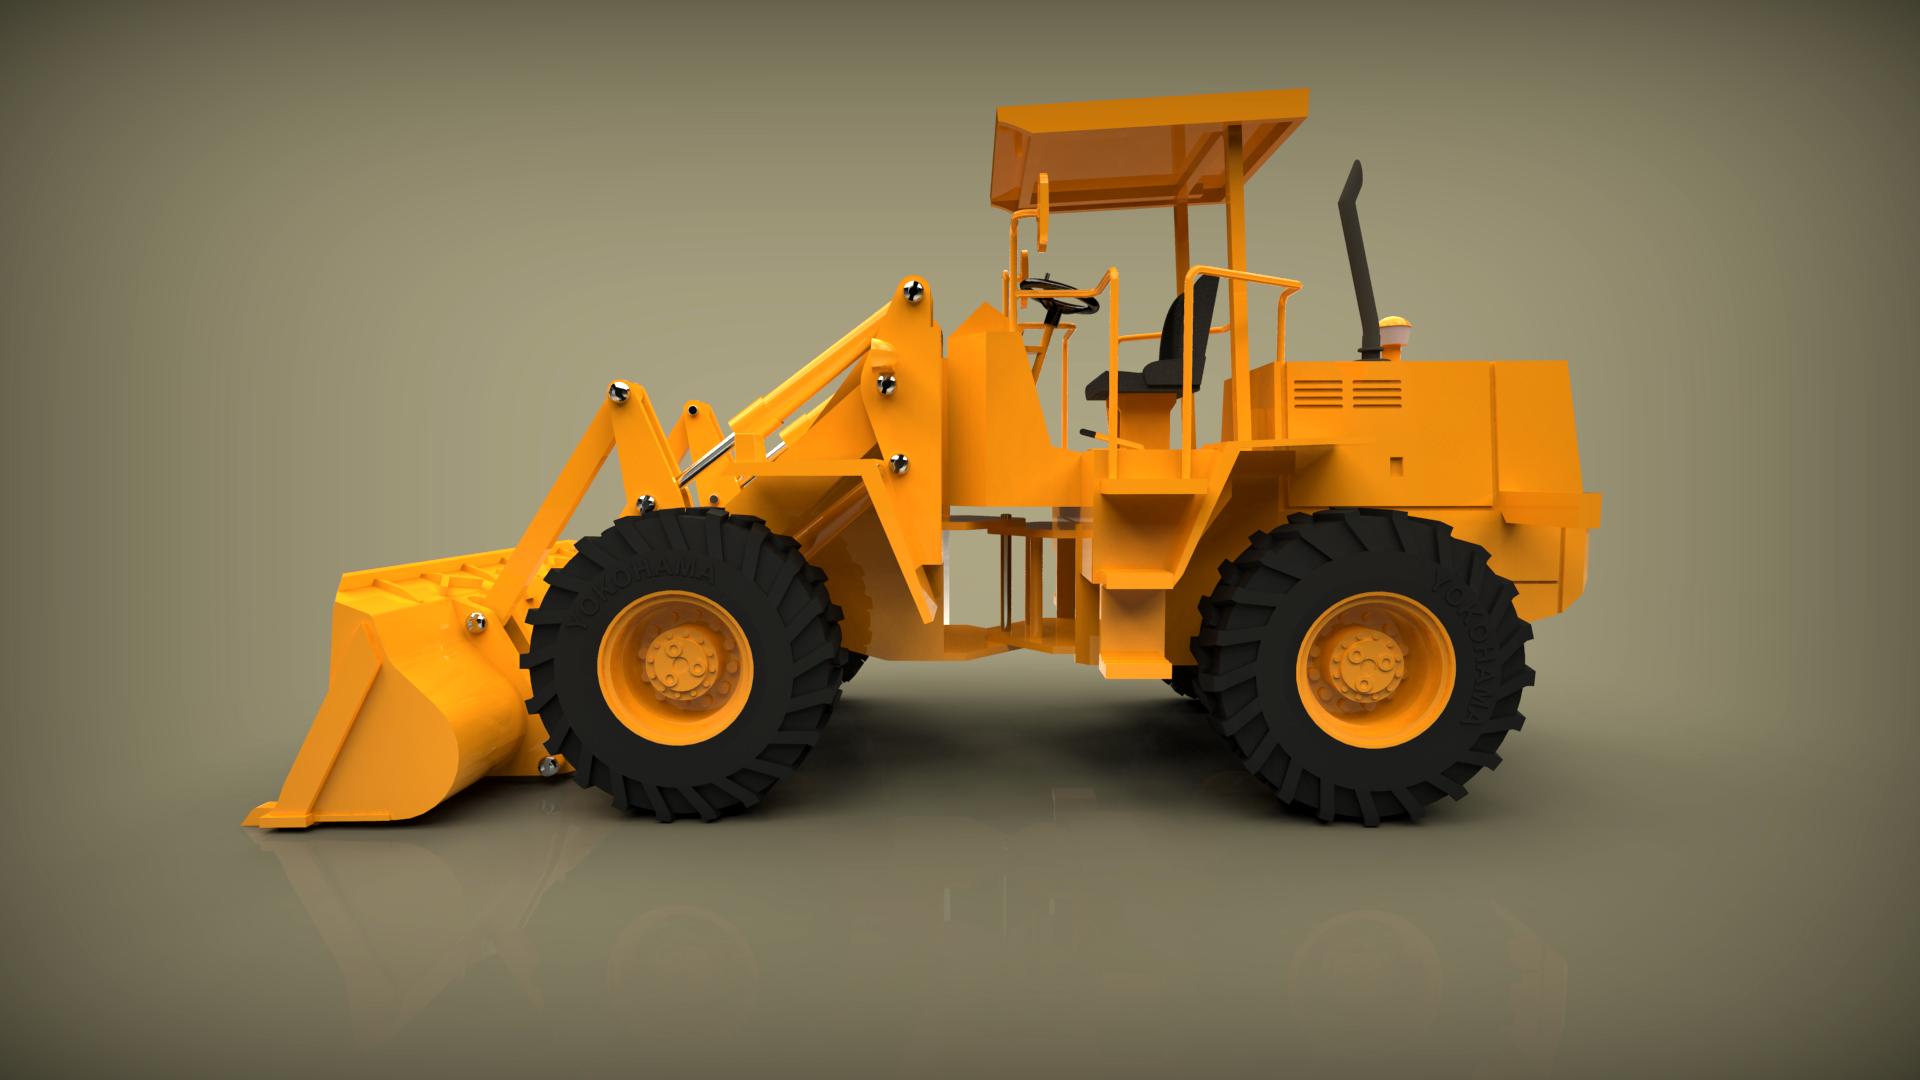 Novo Ambiente para Download de Blocos e Modelos 2D e 3D FP